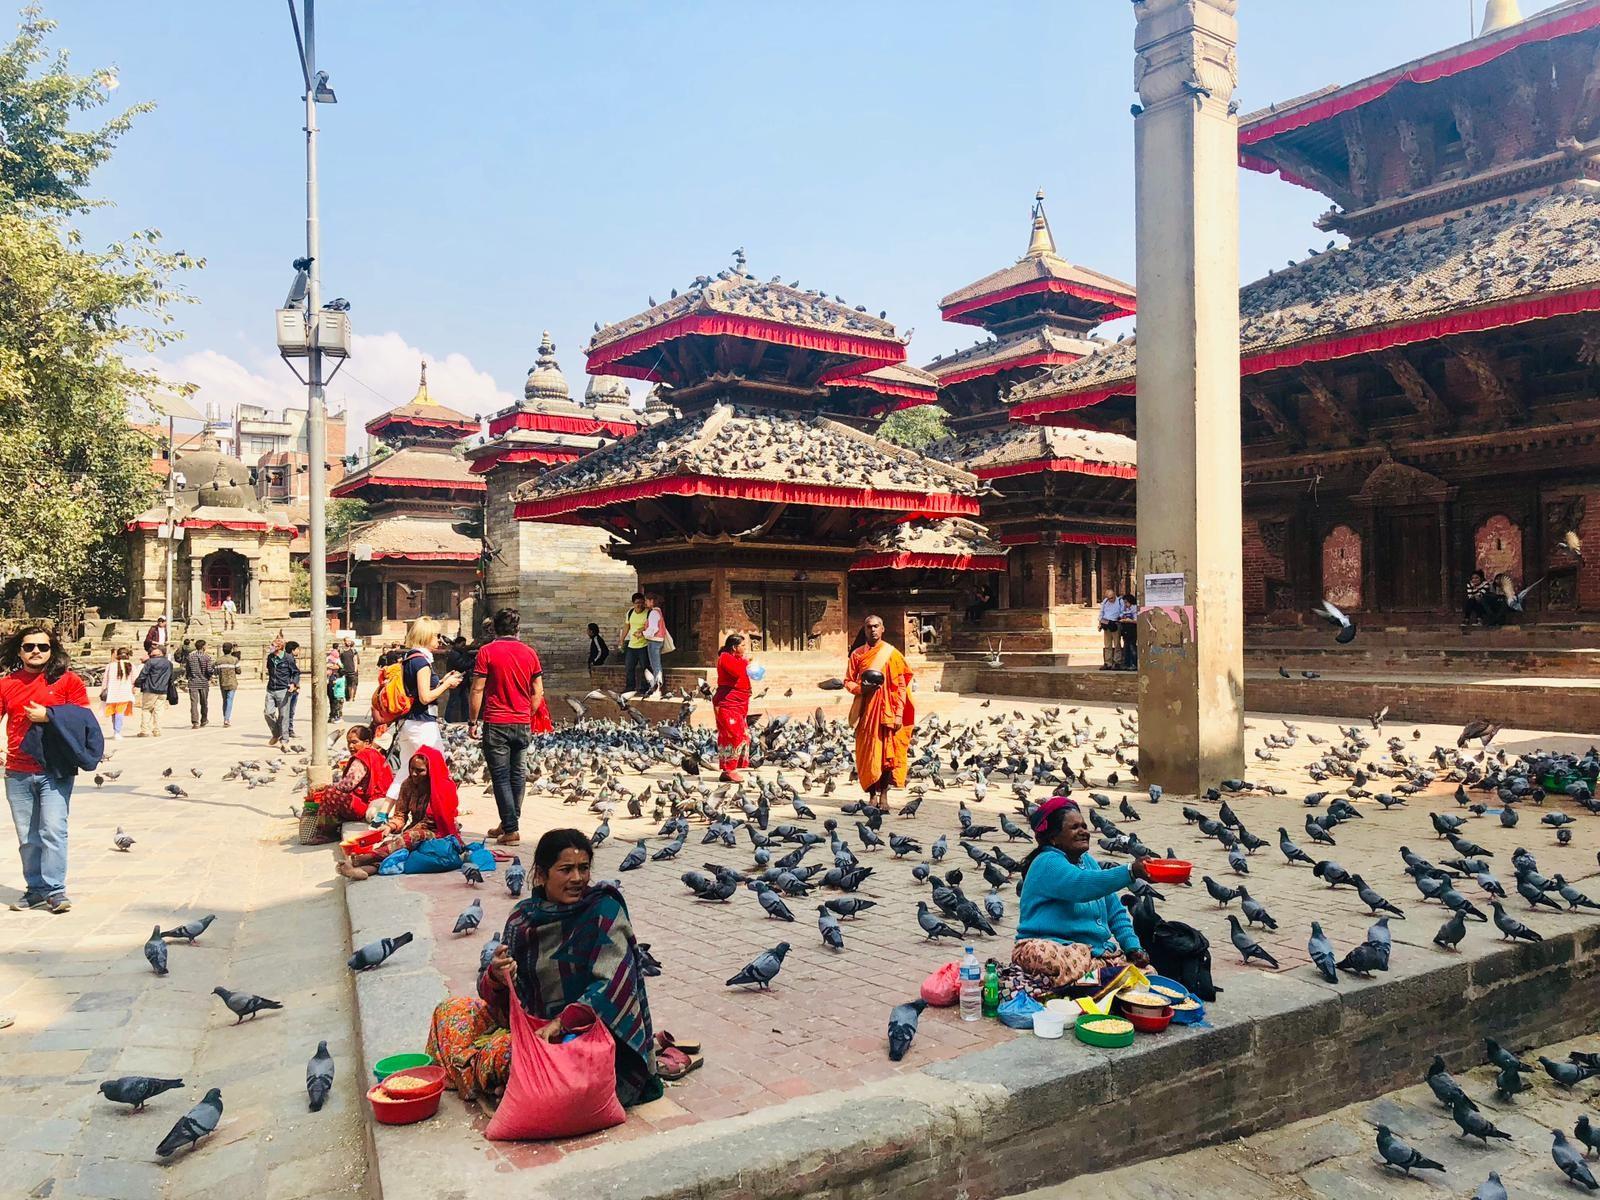 viaggio-in-nepal-4b061f2e9dfebbdbb79ebfe